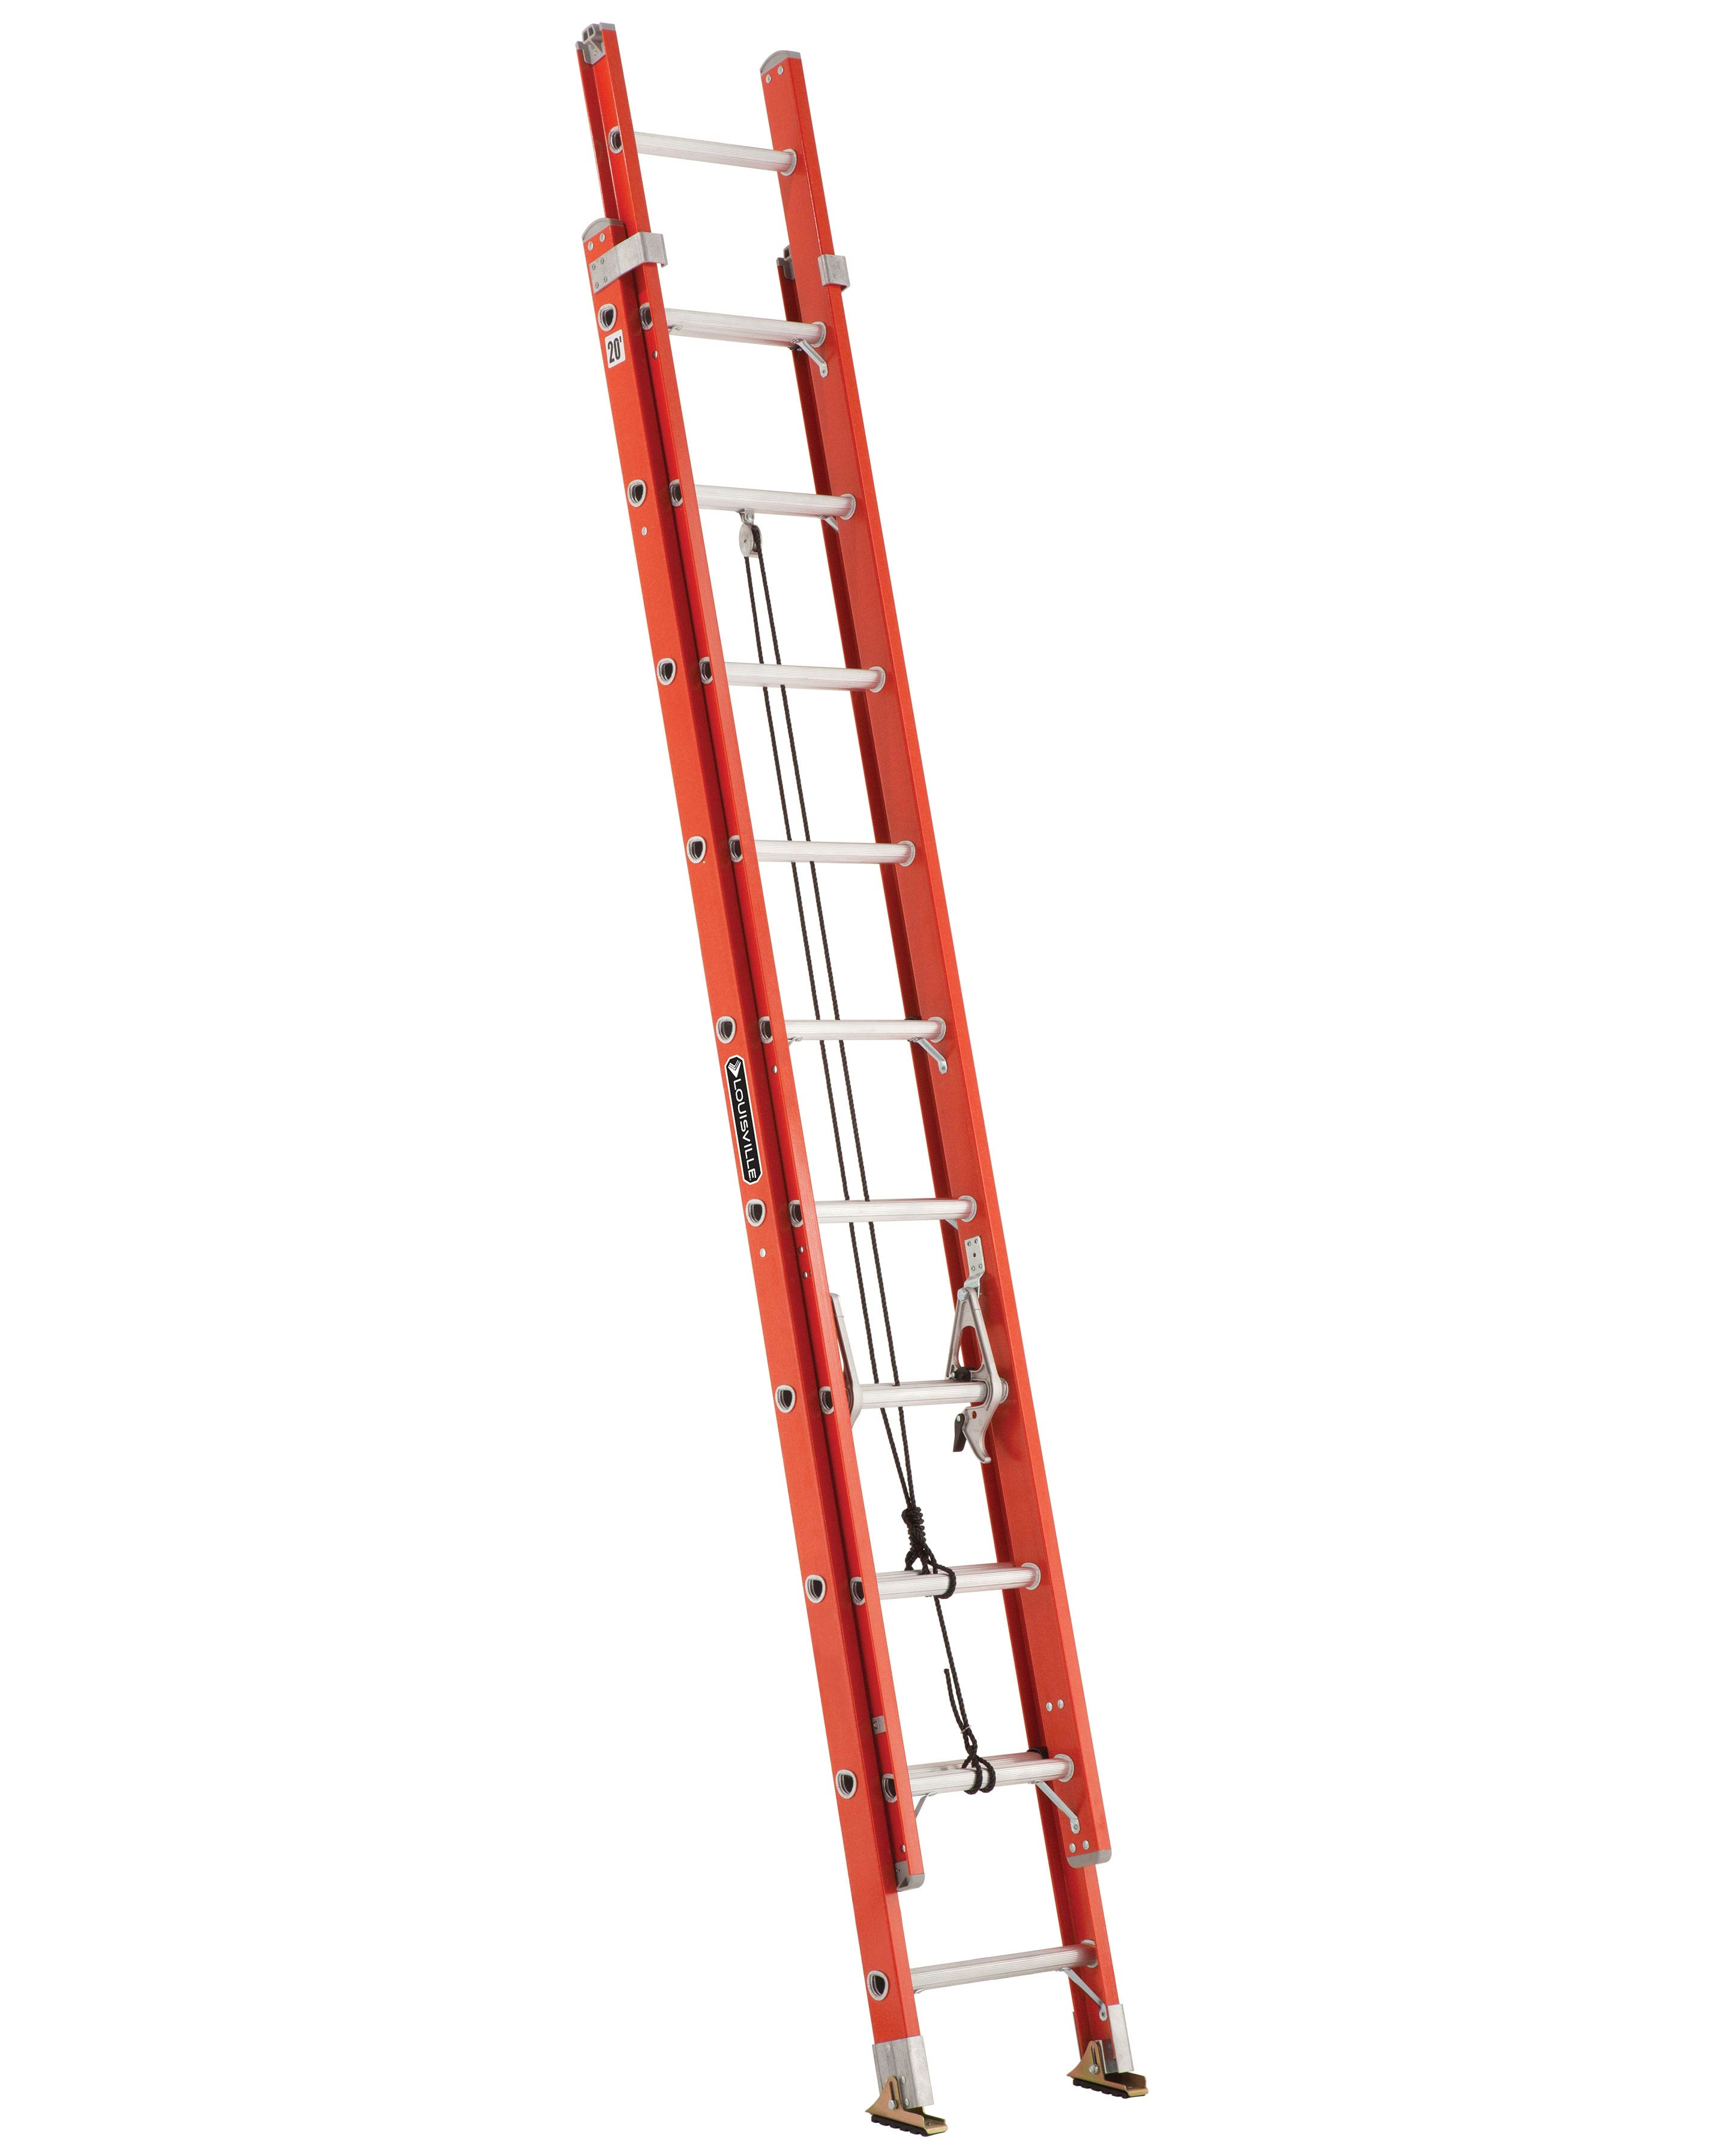 LOUISVILLE LADDERS LOUISVILLE FE3220 20FT FIBERGLASS EXTENSION LADDER 300-Pound Capacity